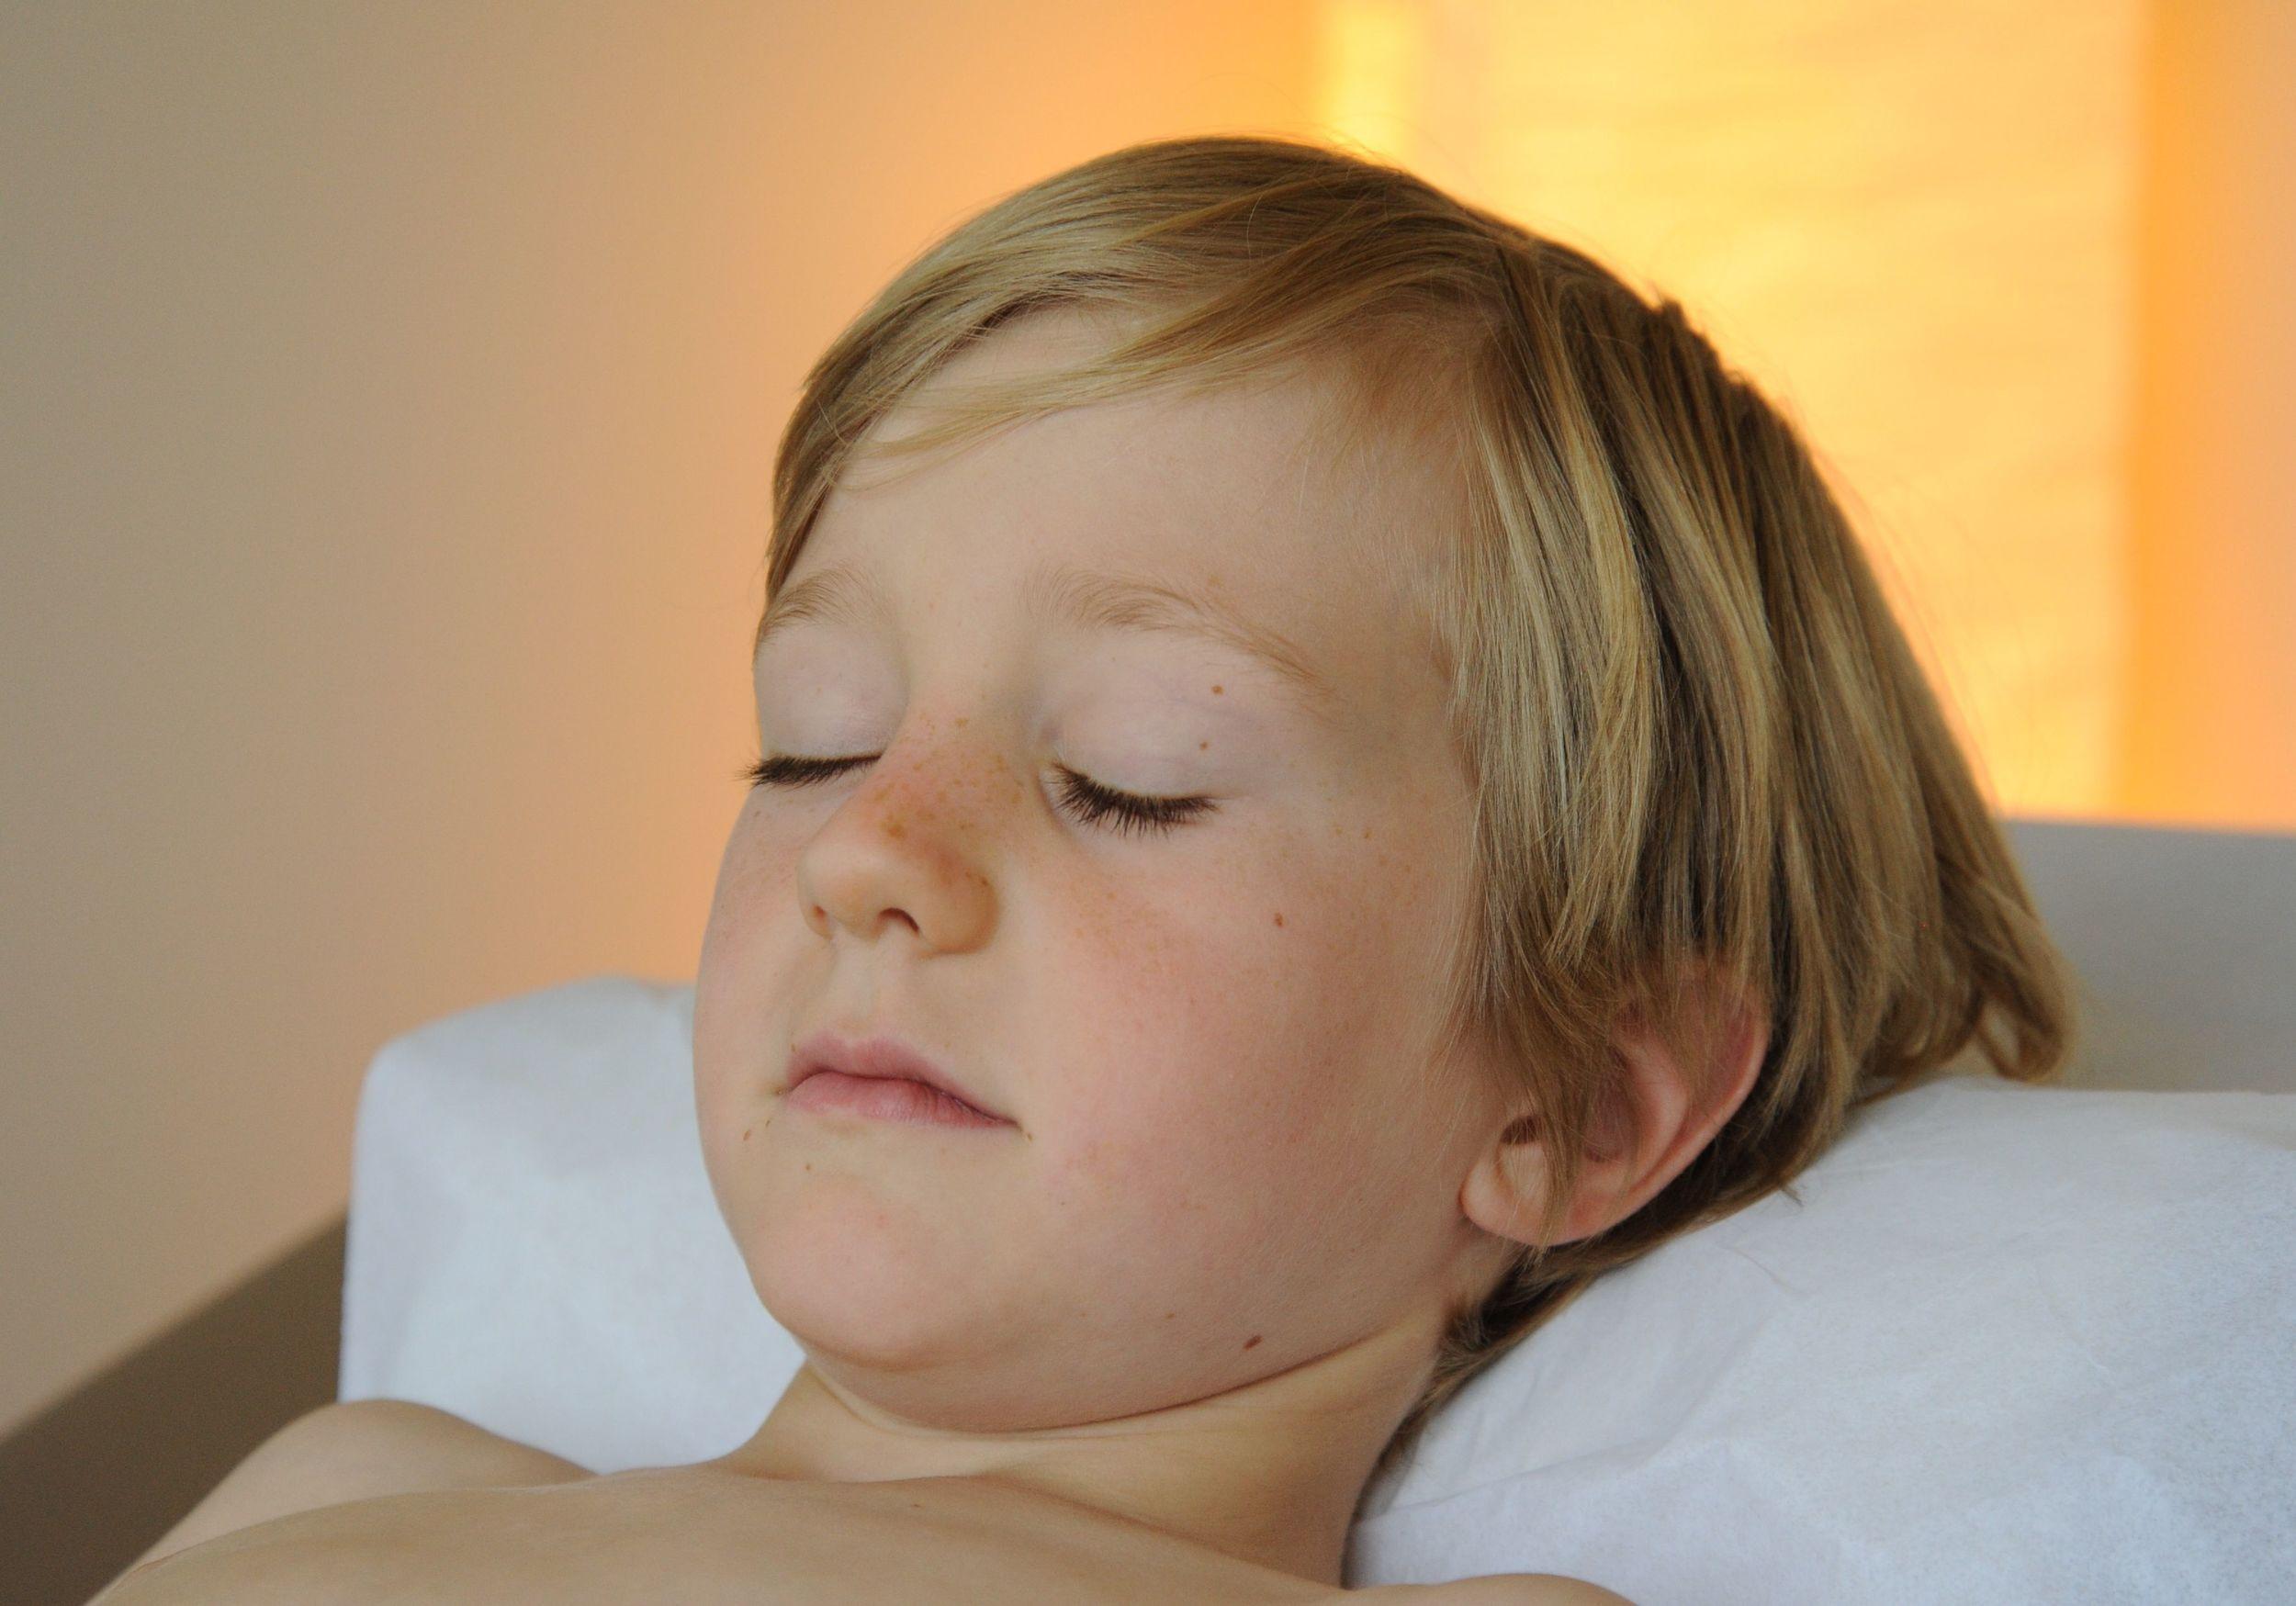 Pediatric Acupuncture; Photo Courtesy of Dave Clark